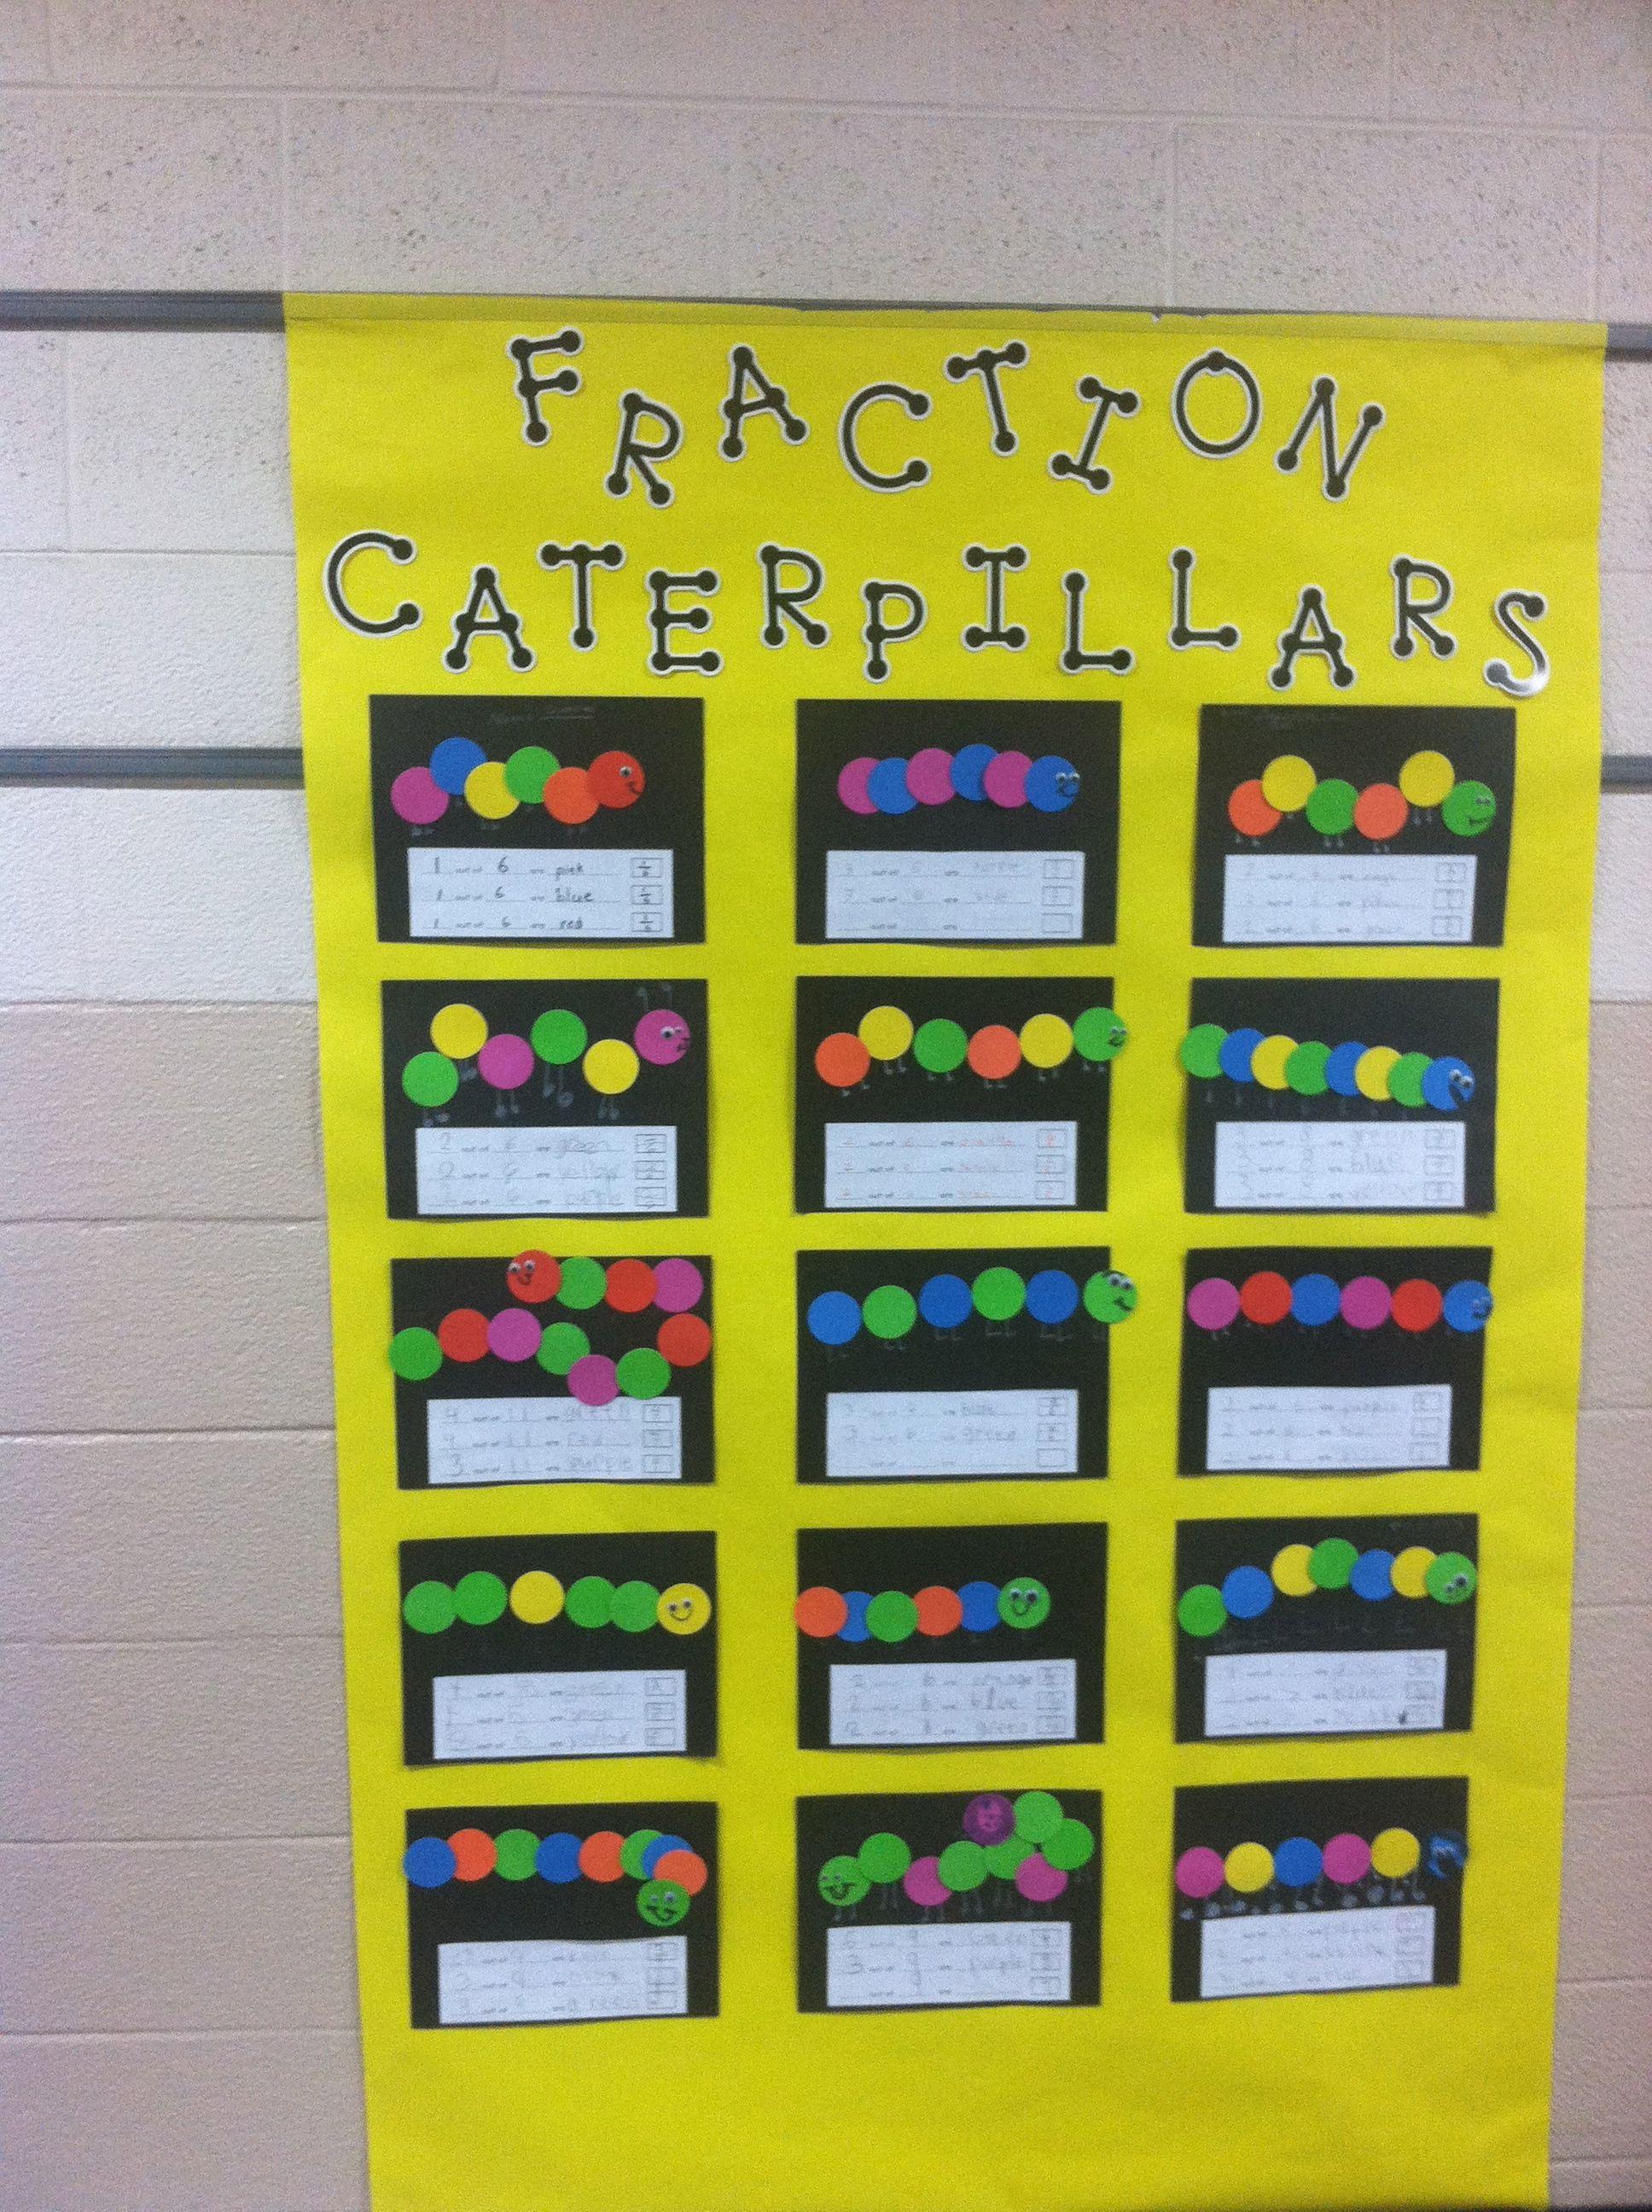 Fraction Caterpillars